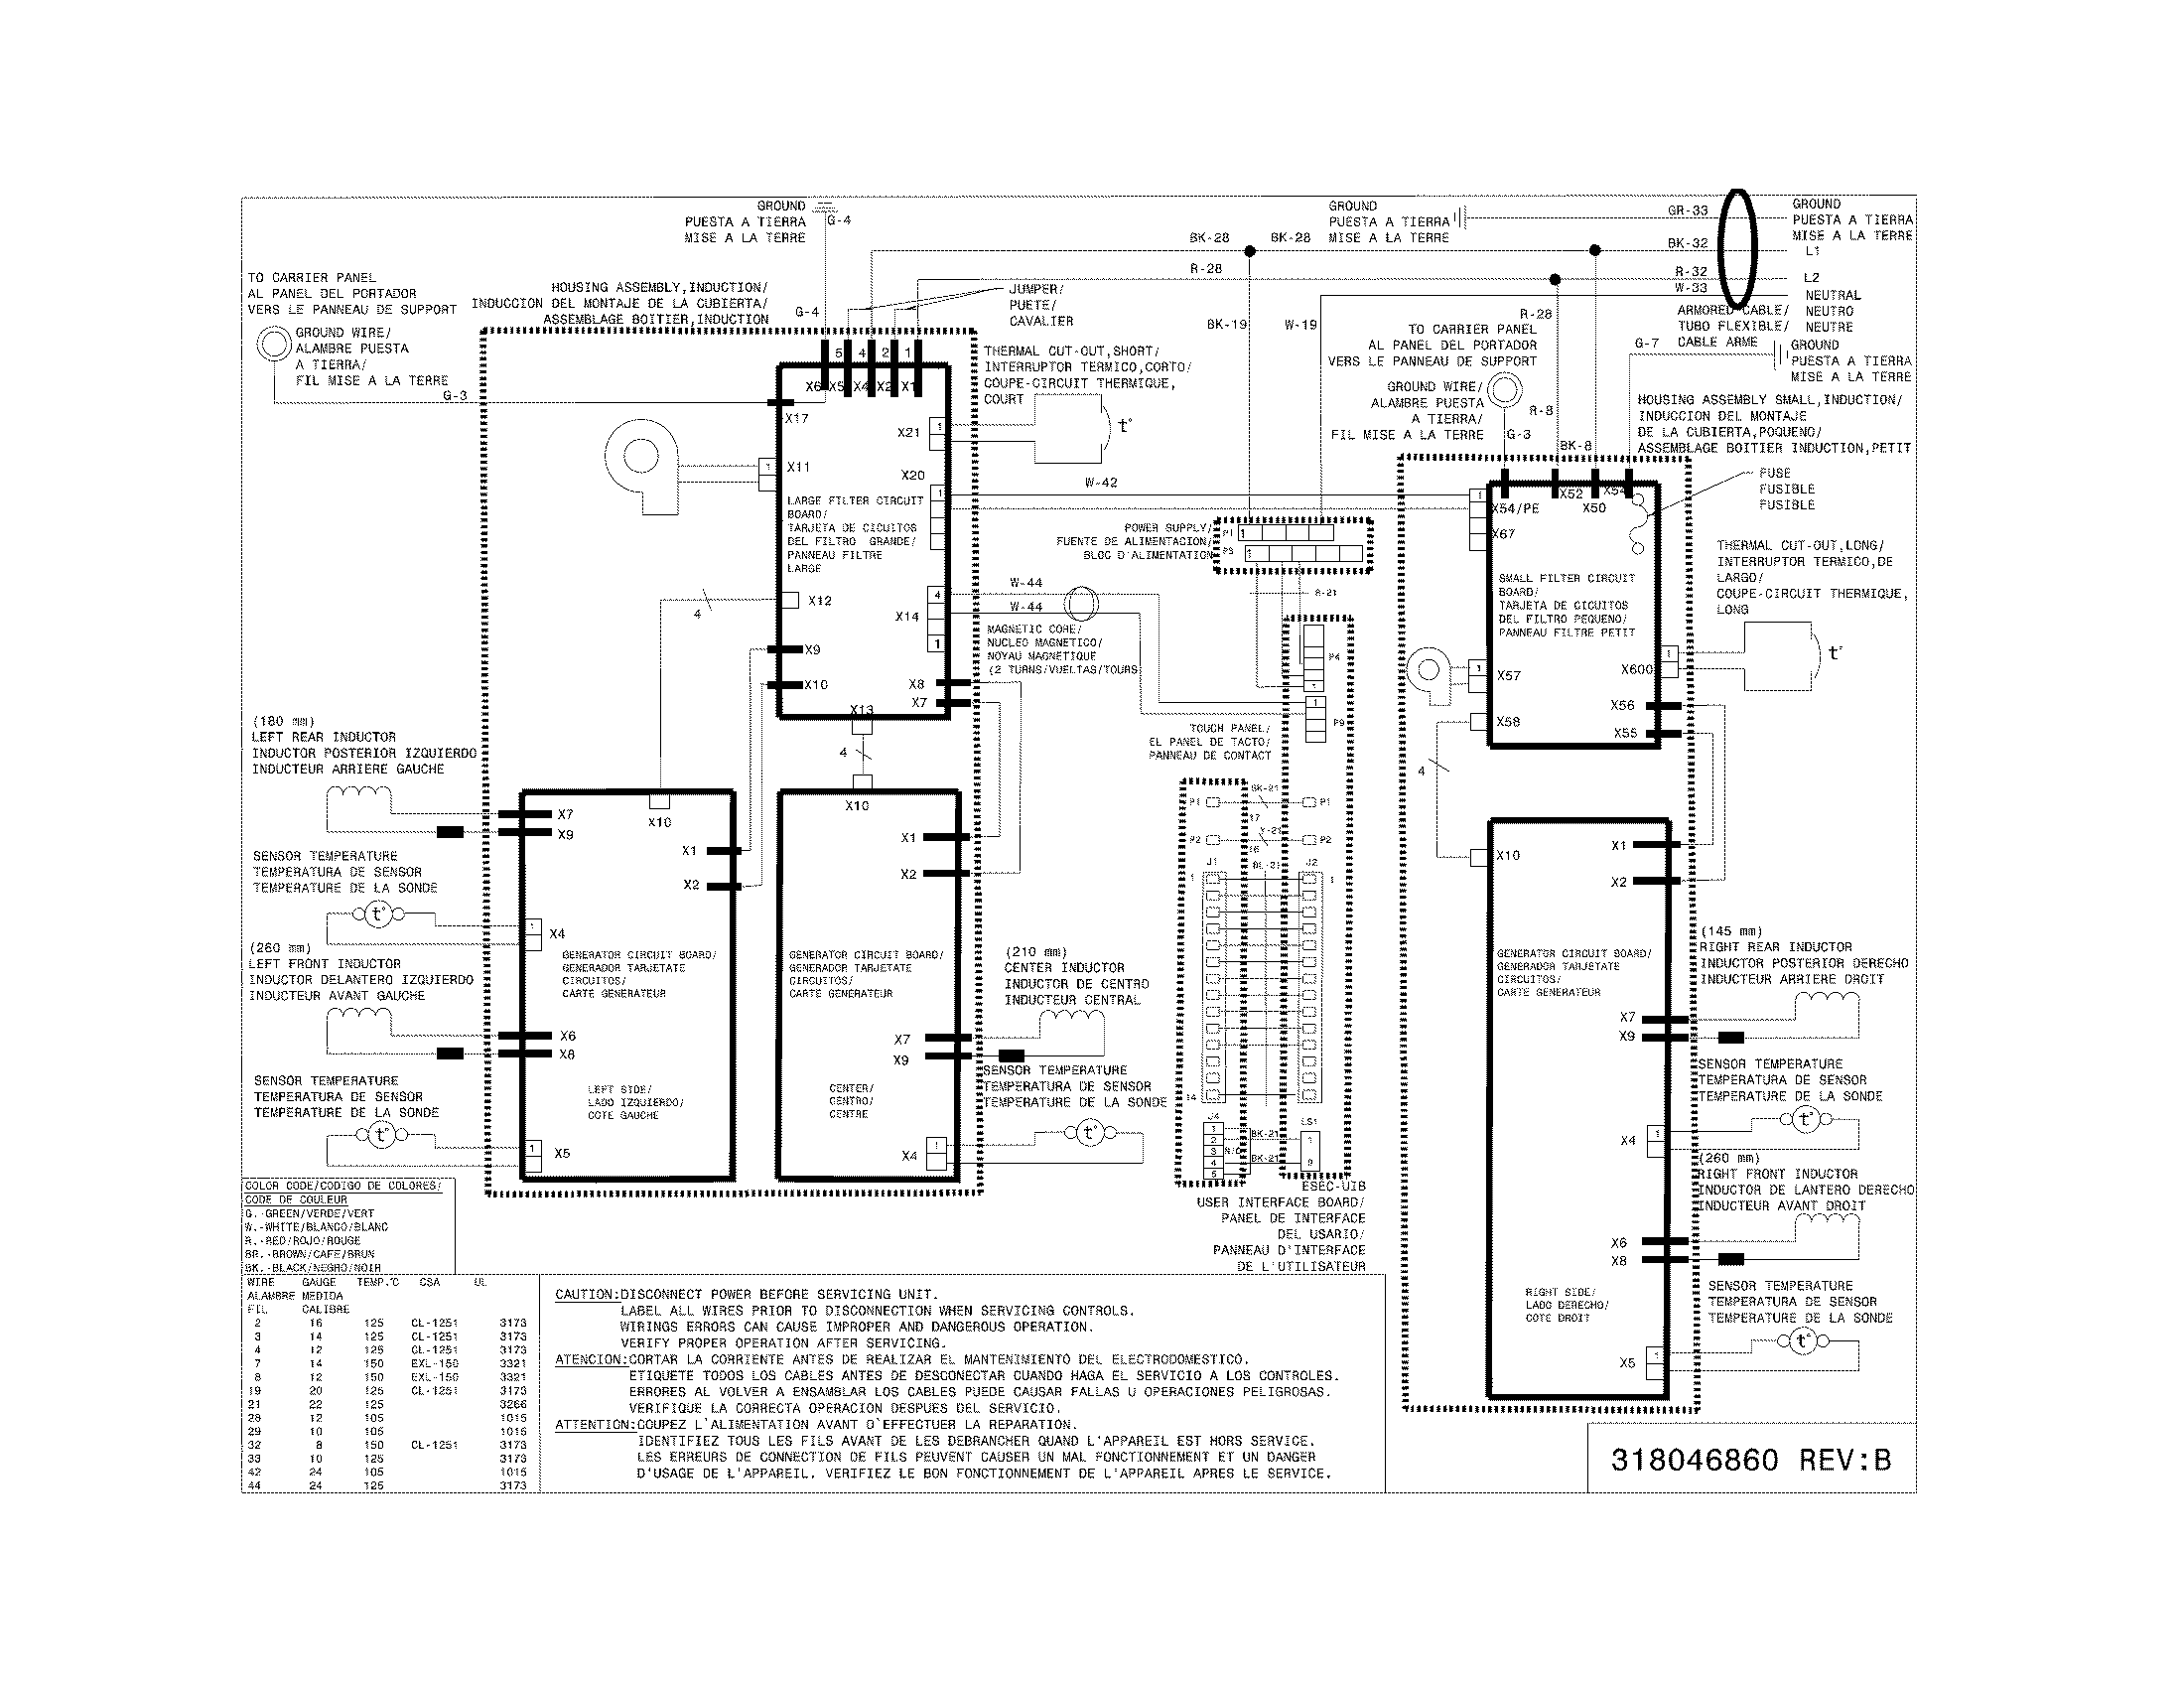 2002 ezgo workhorse wiring diagram